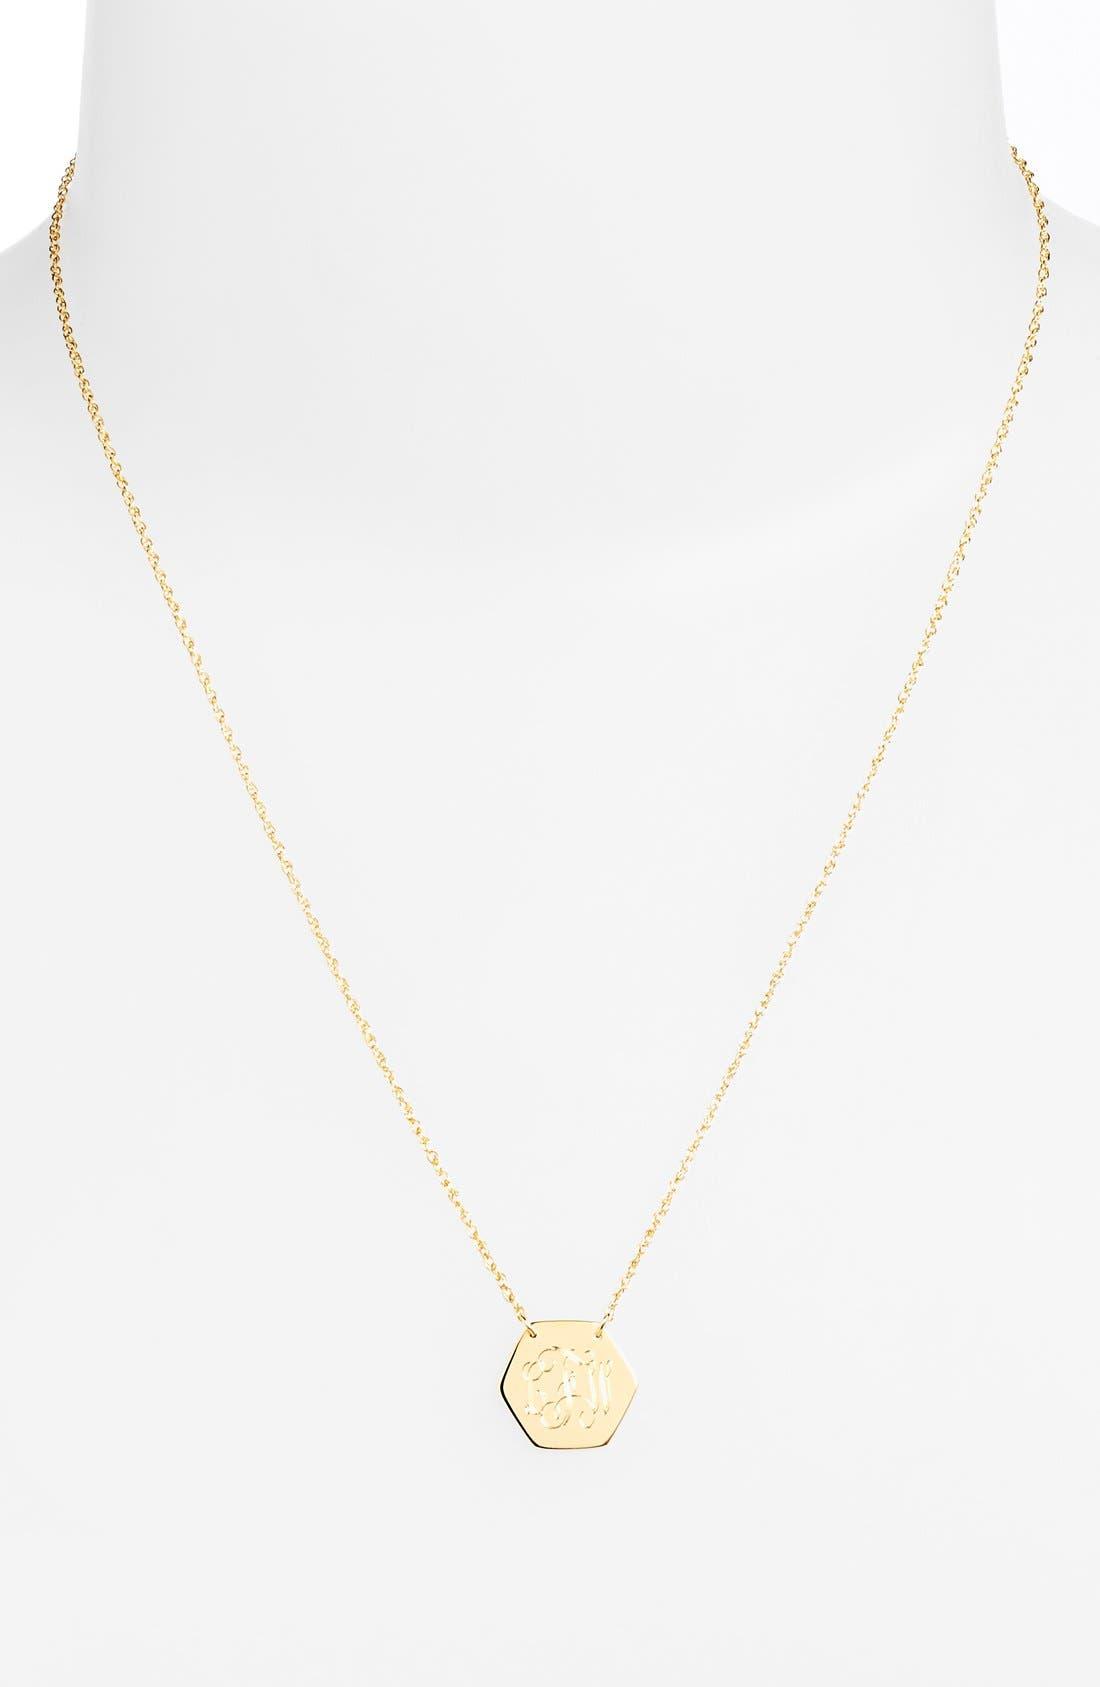 Personalized Hexagon Pendant Necklace,                             Alternate thumbnail 5, color,                             GOLD